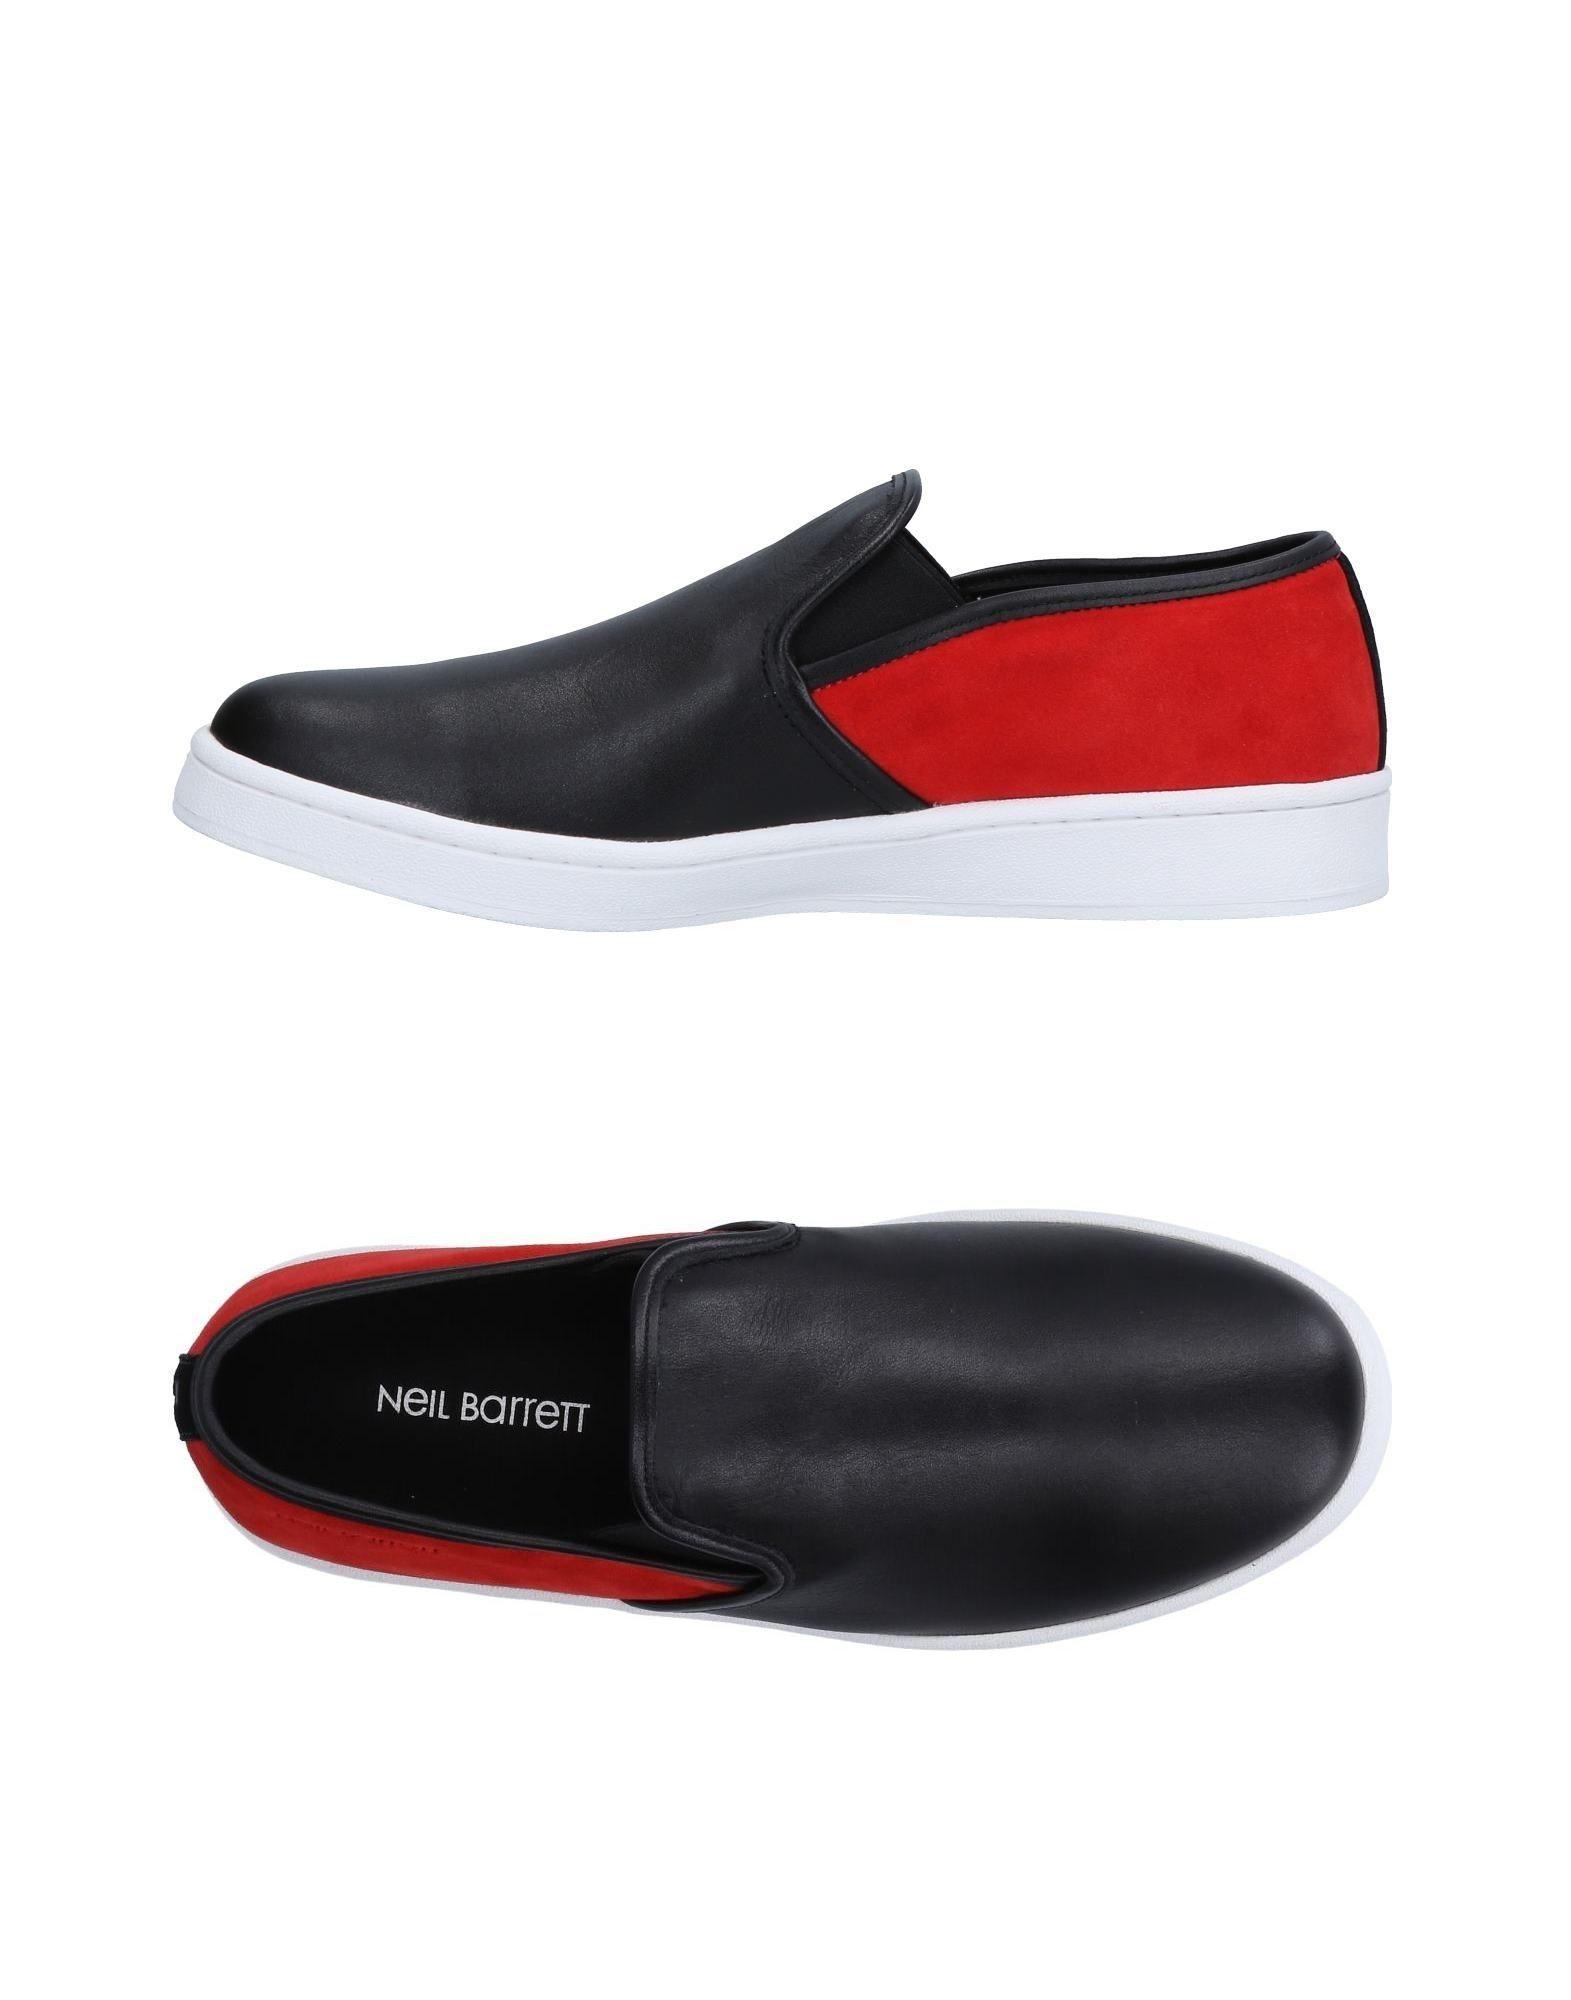 Neil Barrett Sneakers Herren  11522269LJ Gute Qualität beliebte Schuhe